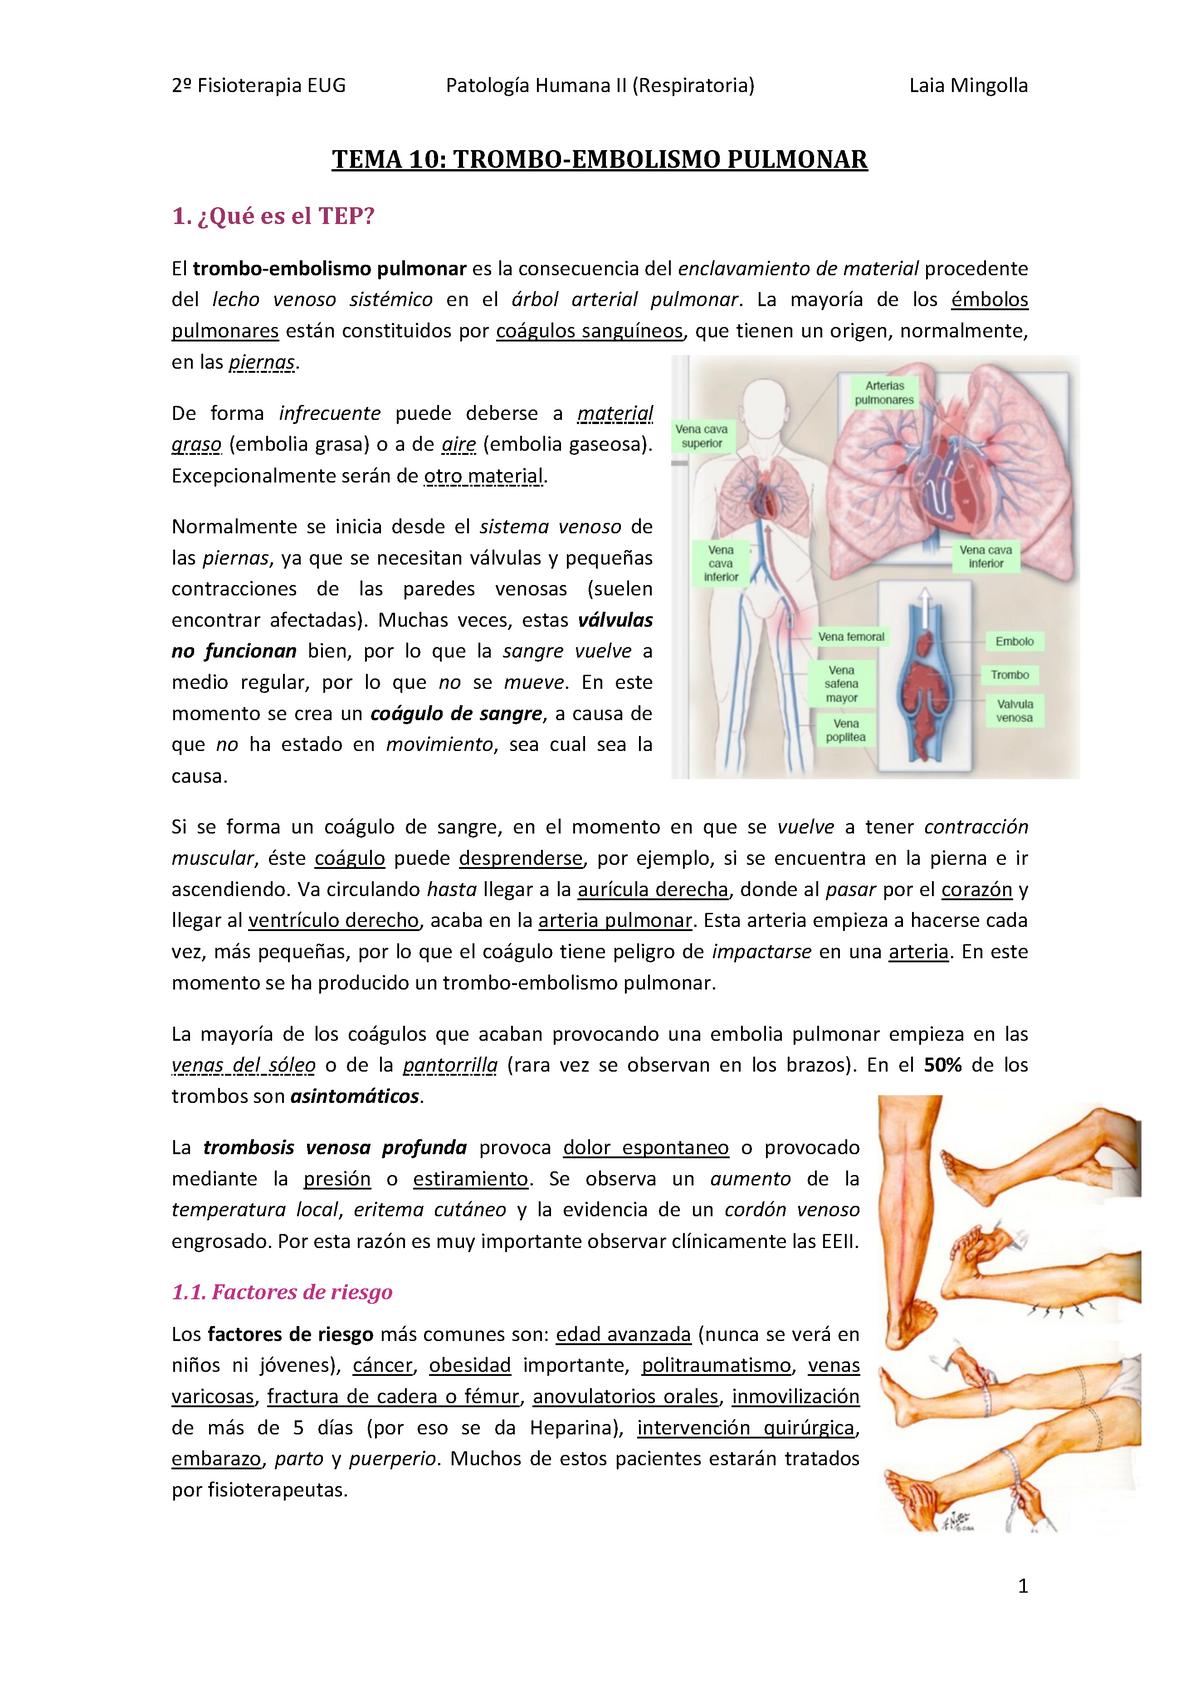 Síndrome de embolia gaseosa arterial